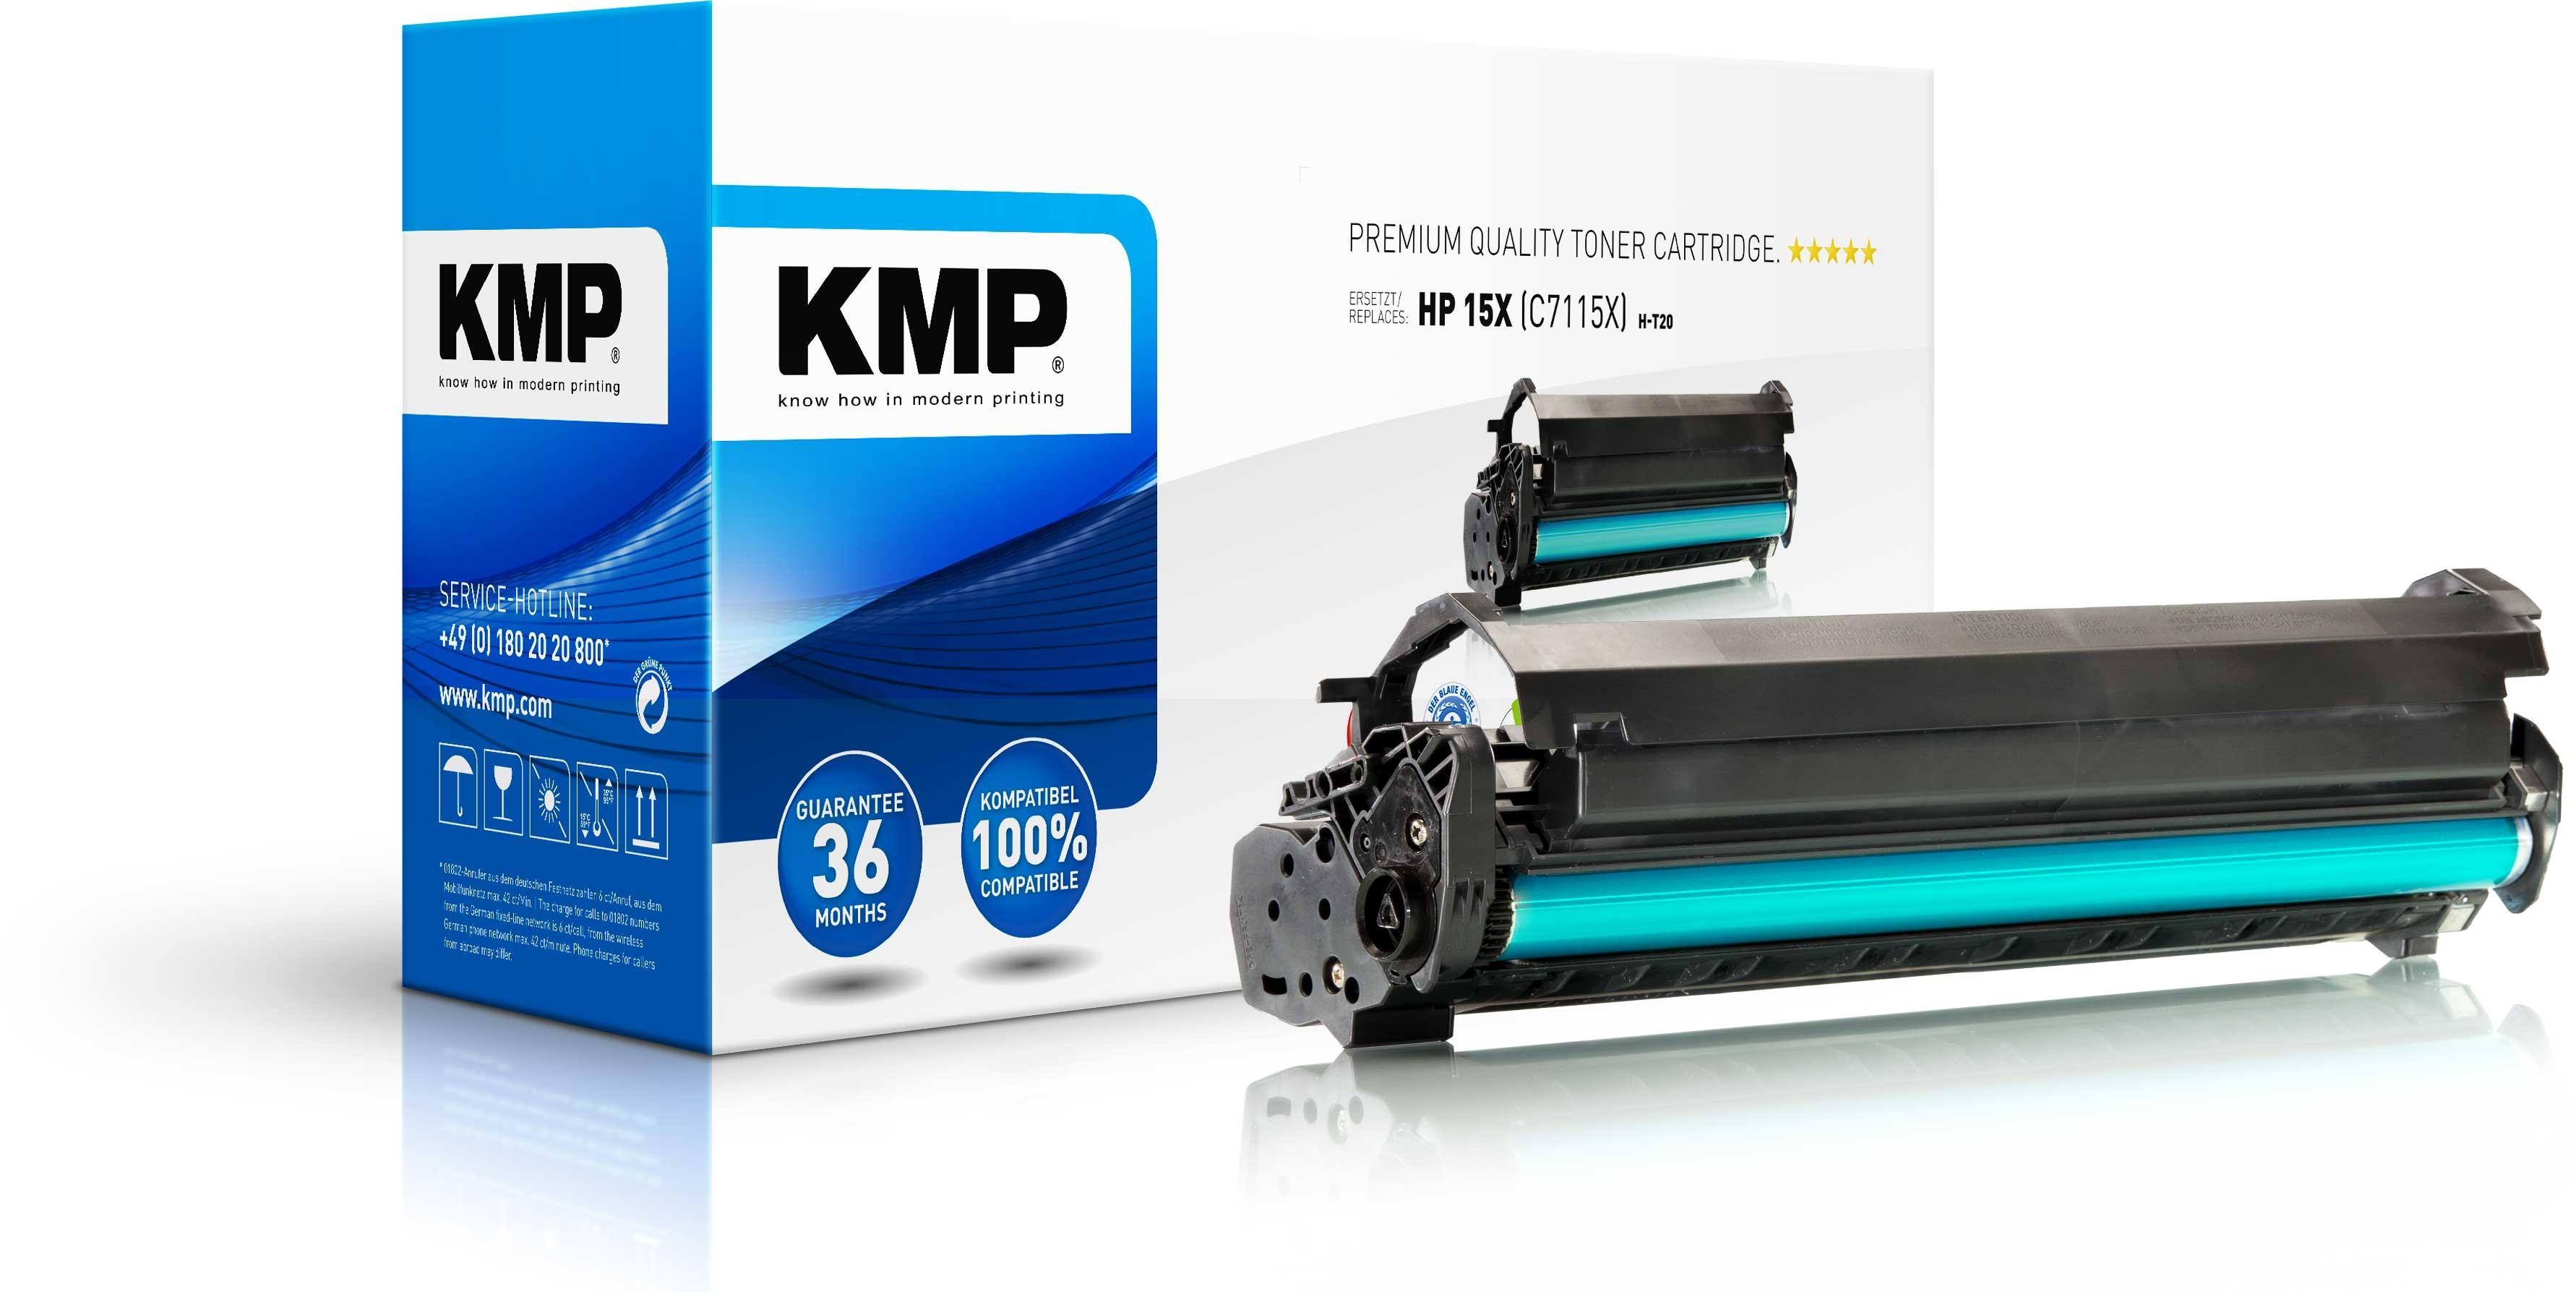 KMP Toner für HP C7115X Laserjet 1005W/1200/N/3300 MFP High Yiel